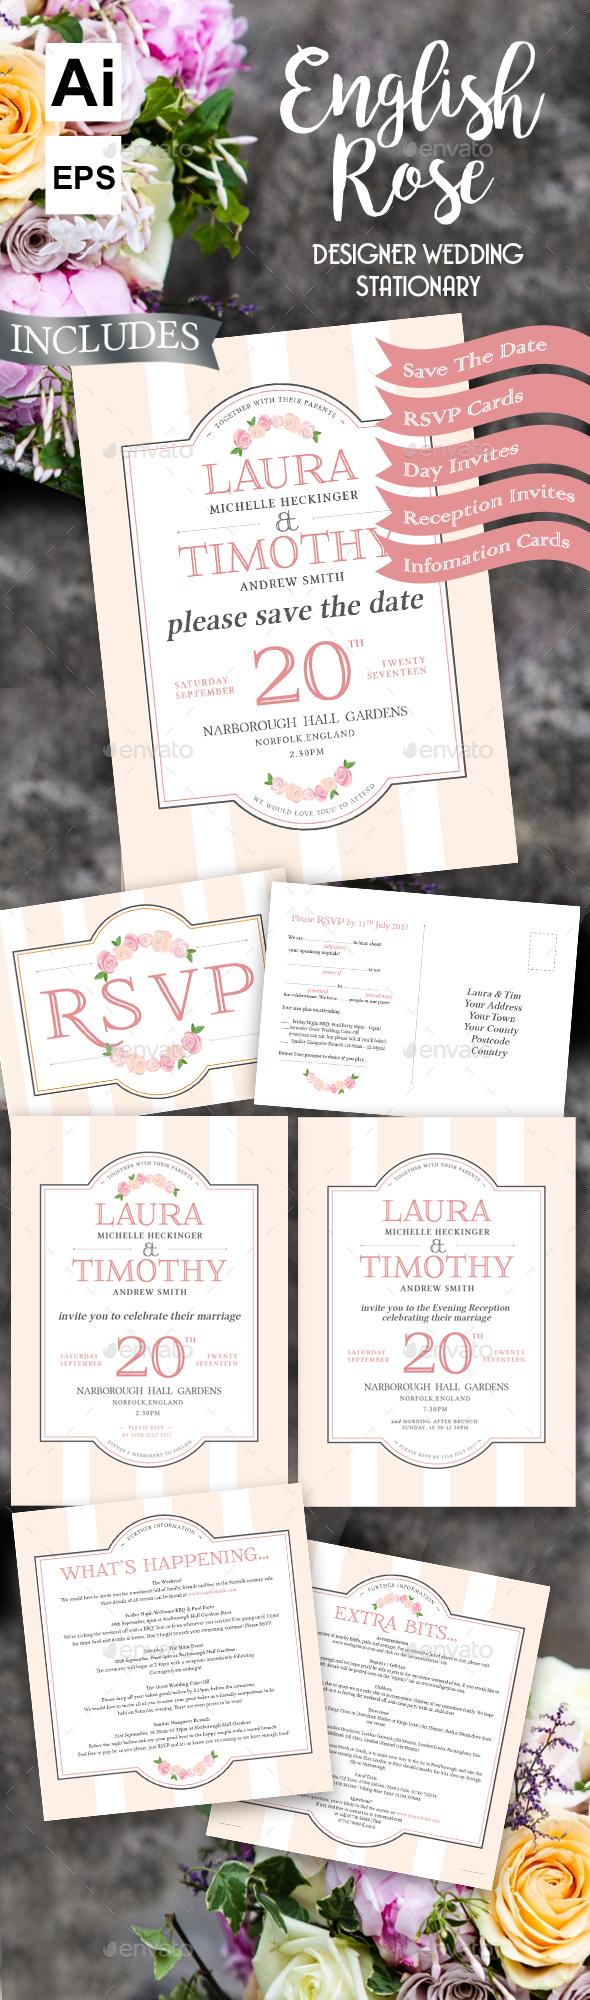 Wedding Invite Etiquette 65 Lovely Wedding Invite Suite Weddings